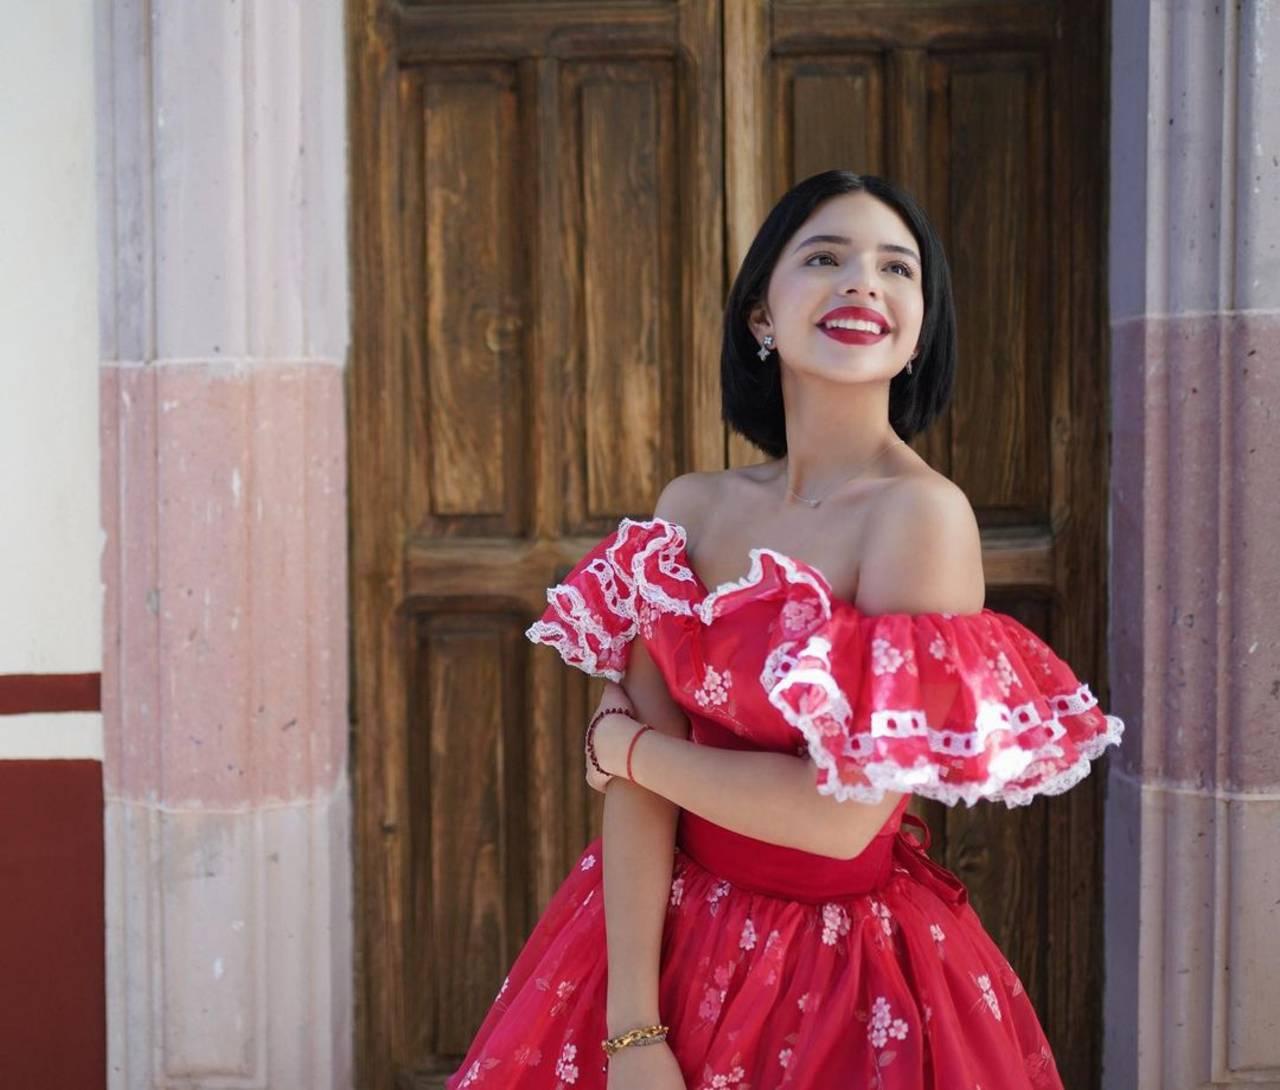 Ángela Aguilar le dan asquito personas infieles